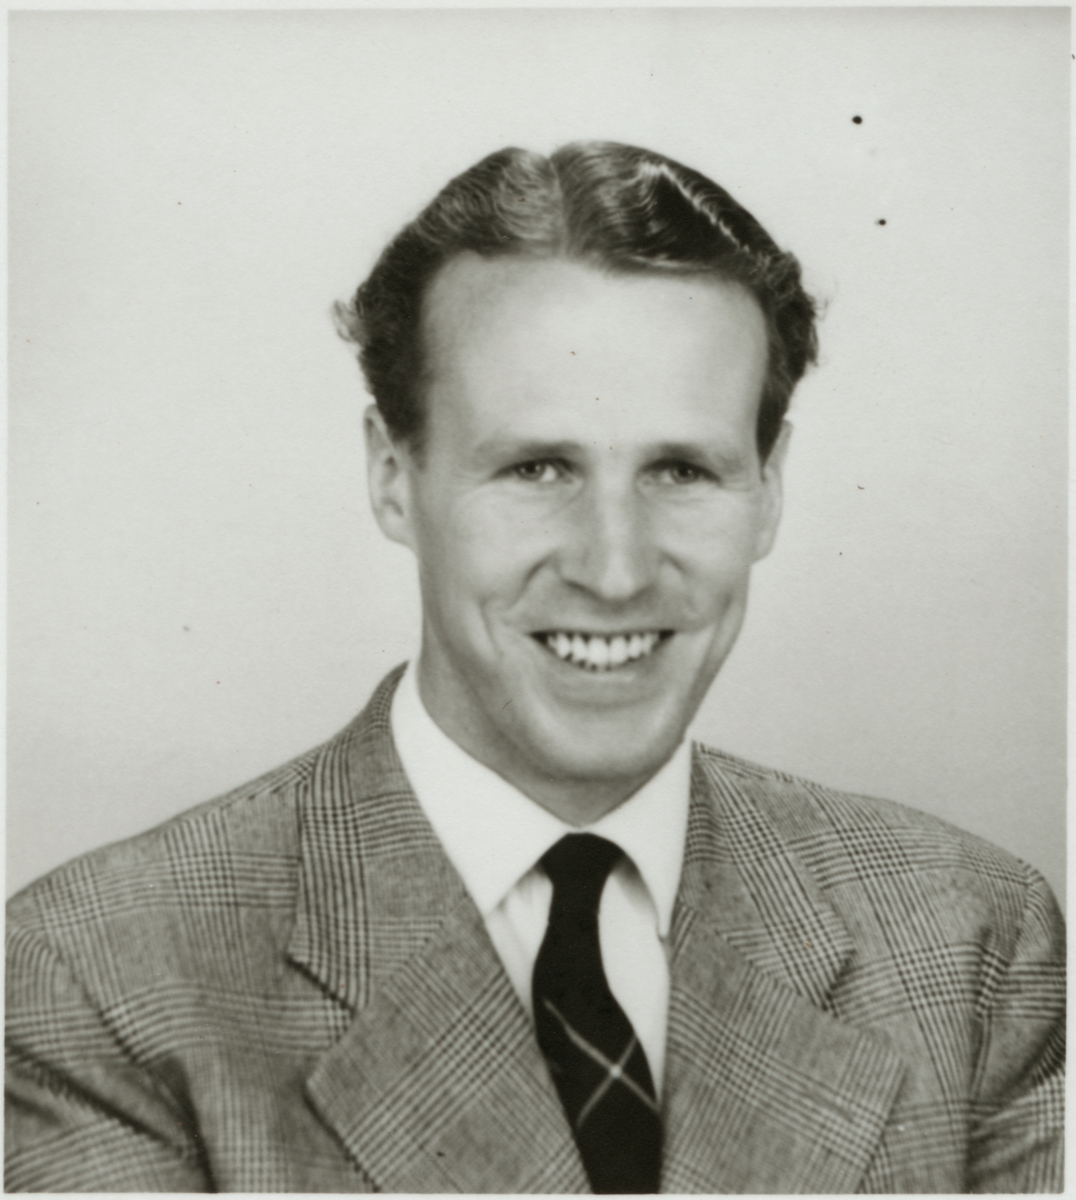 Rune Lindeborg, personalchef, Trafikaktiebolaget Grängesberg – Oxelösunds Järnvägar, TGOJ.